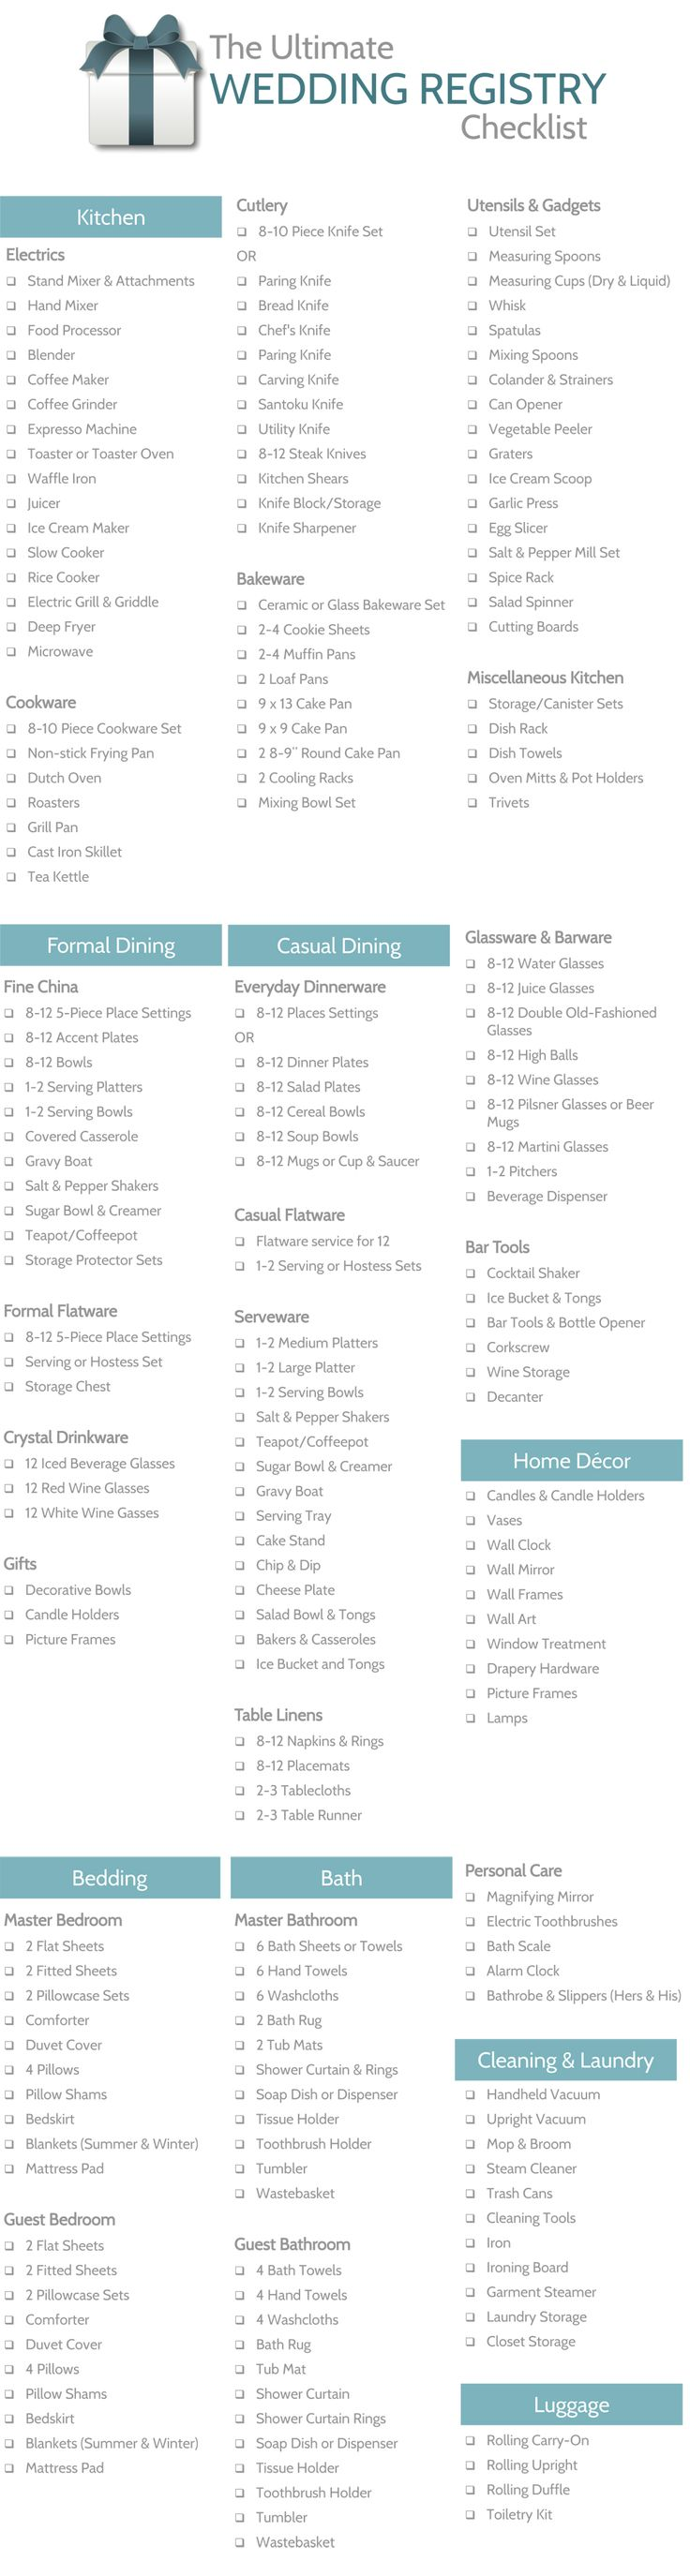 Wedding Registry Checklists